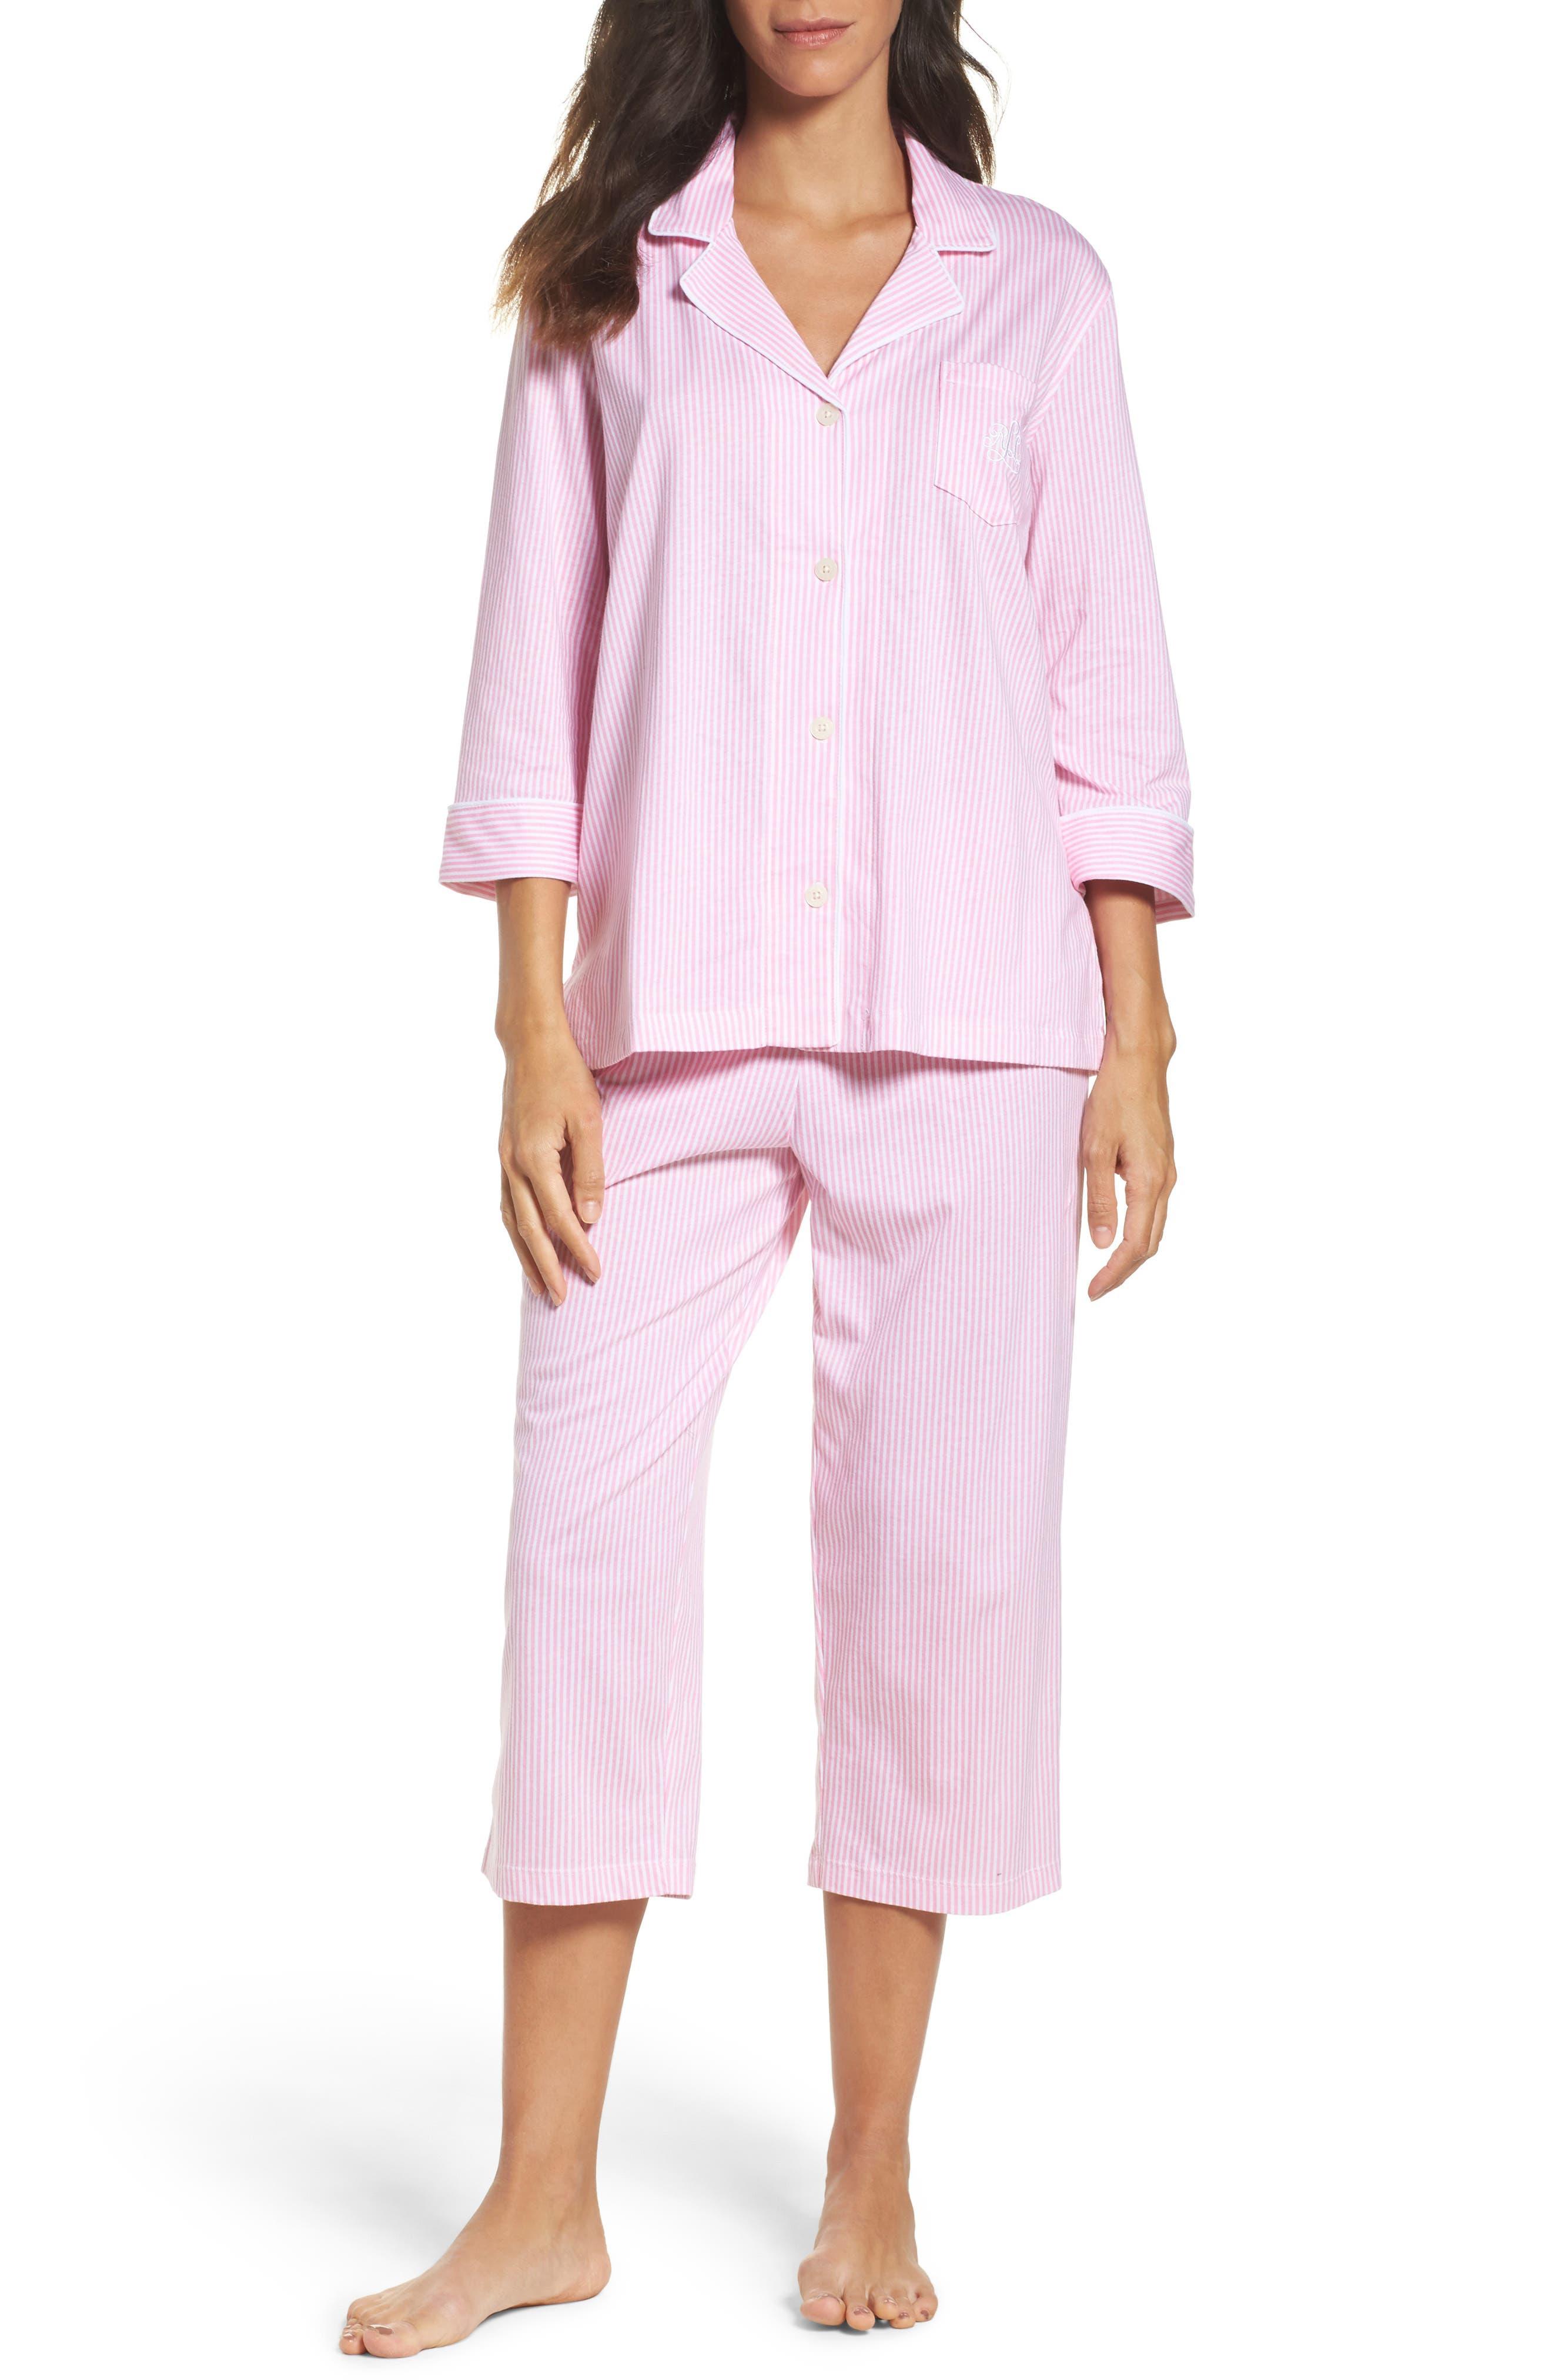 Knit Crop Pajamas,                         Main,                         color, Lagoon Pink/ White Stripe